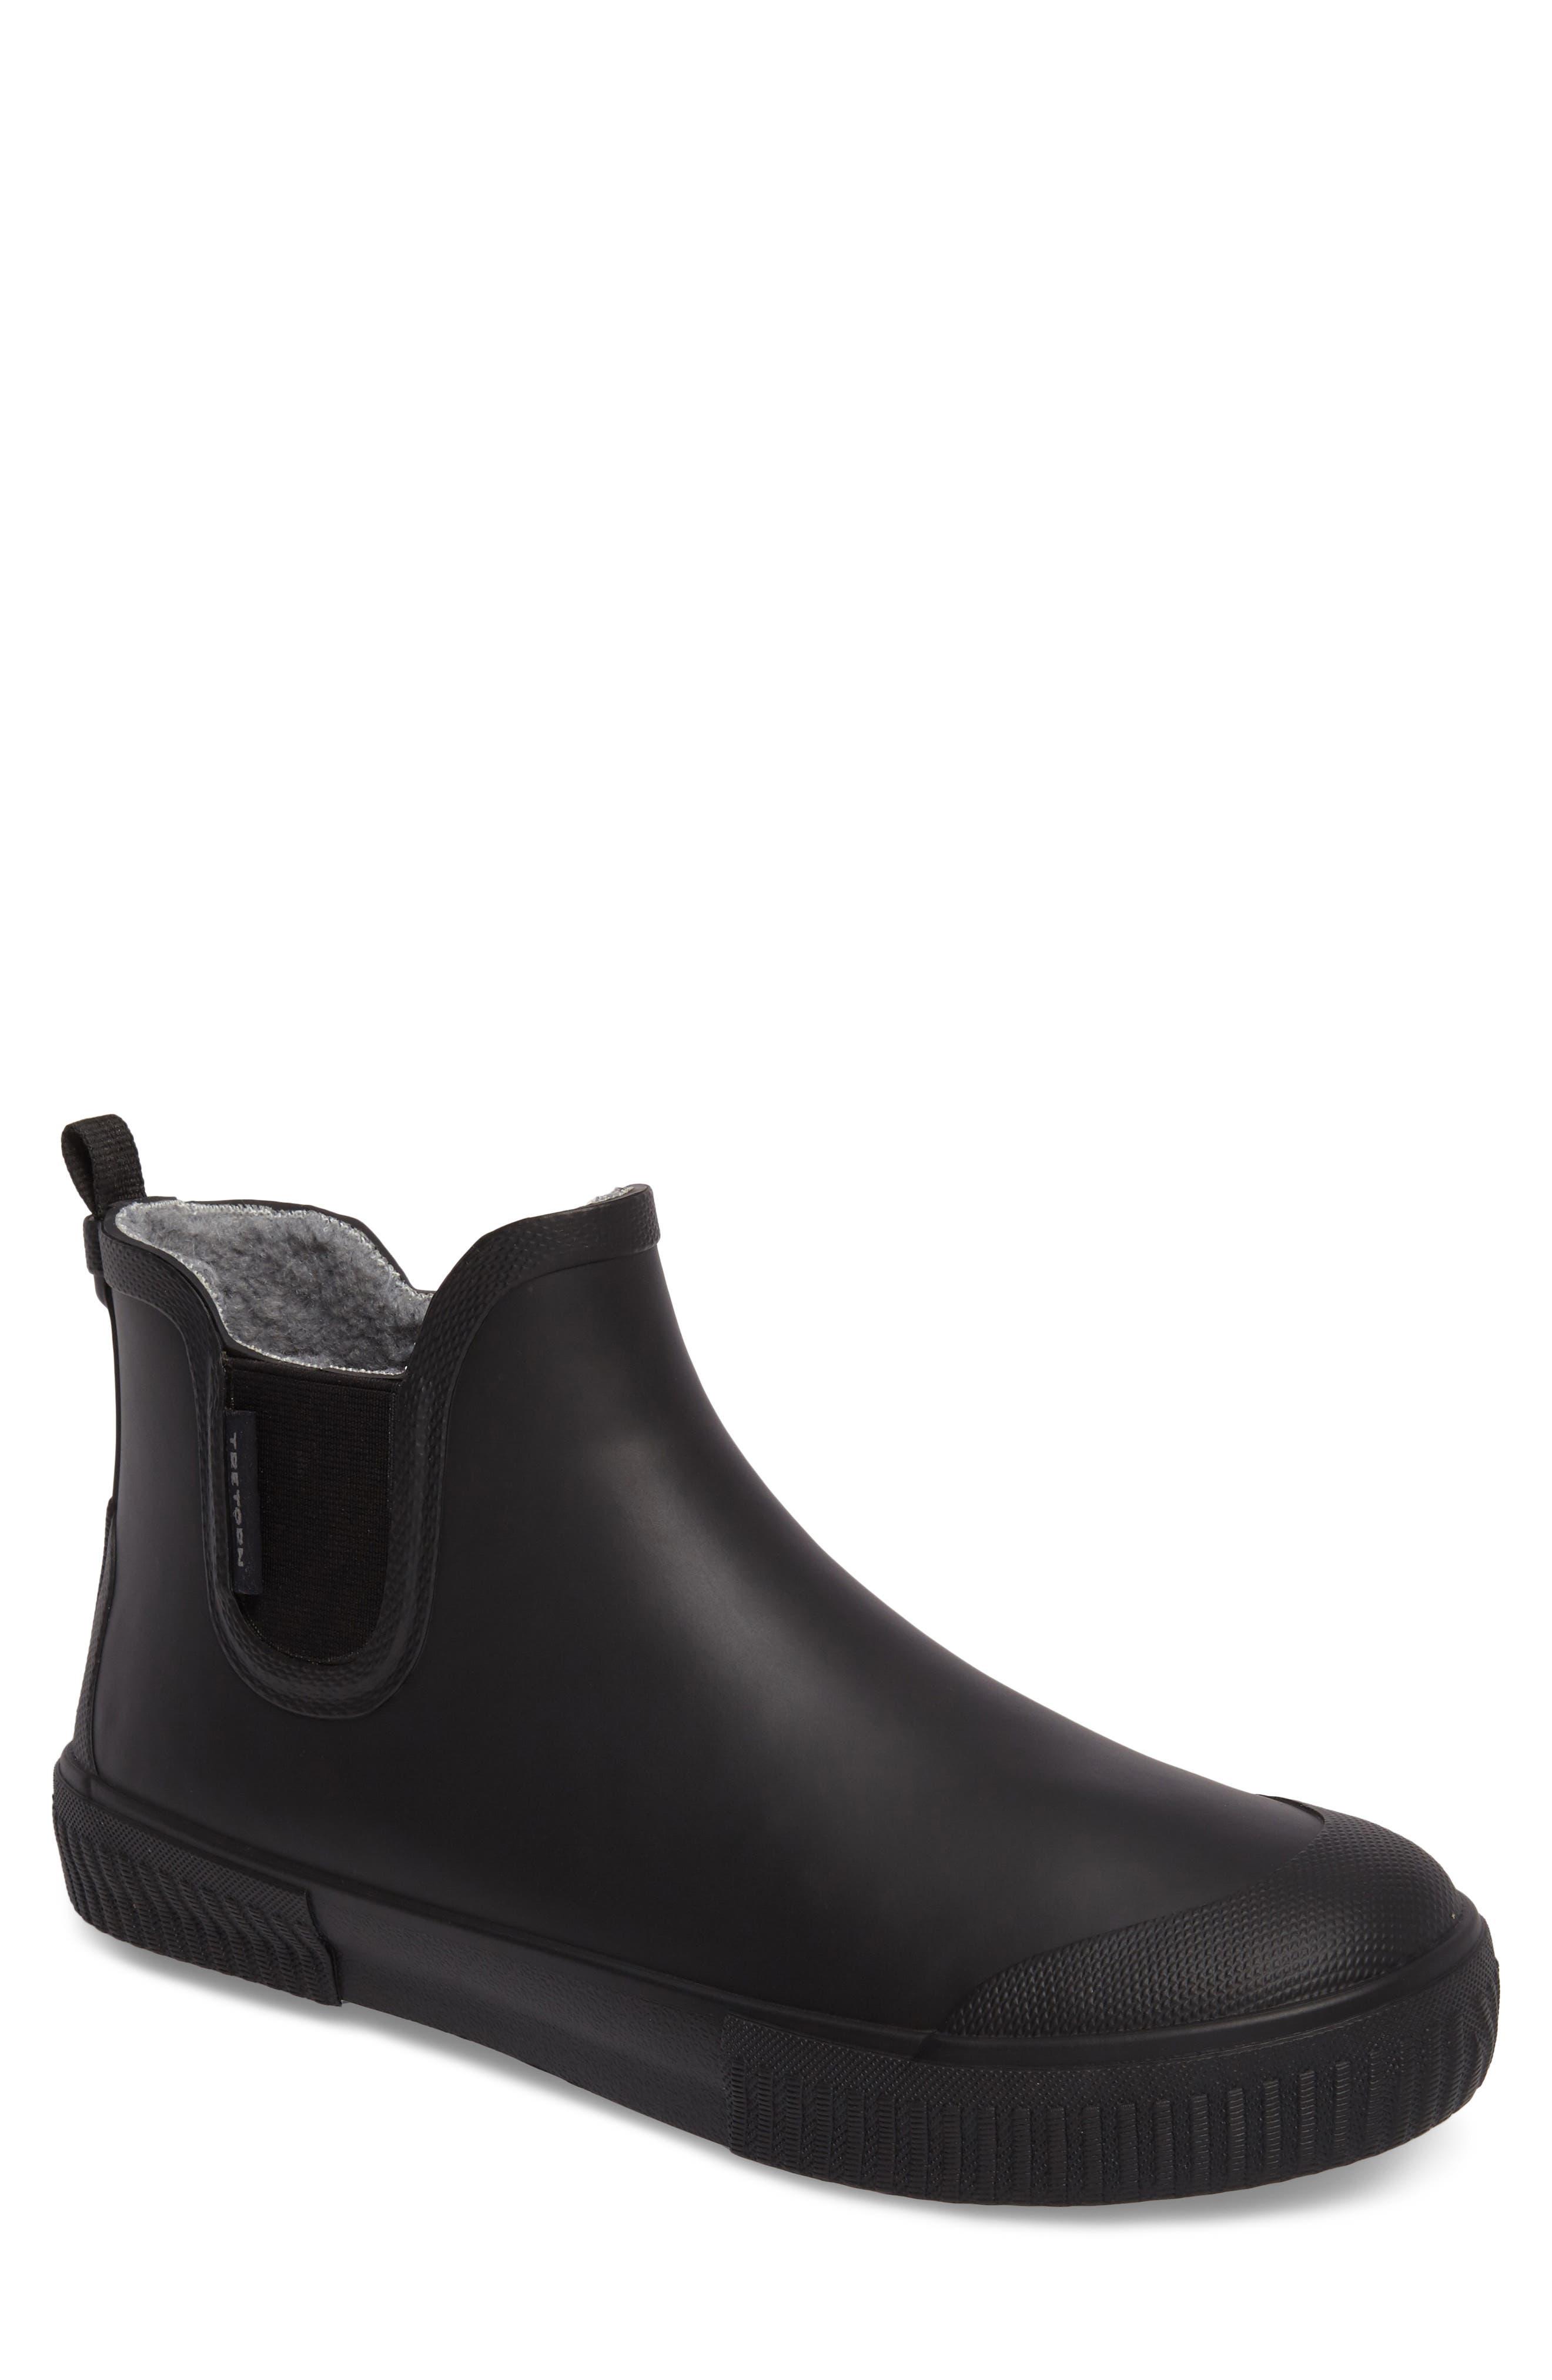 Tretorn Guswnt Chelsea Waterproof Boot, Black